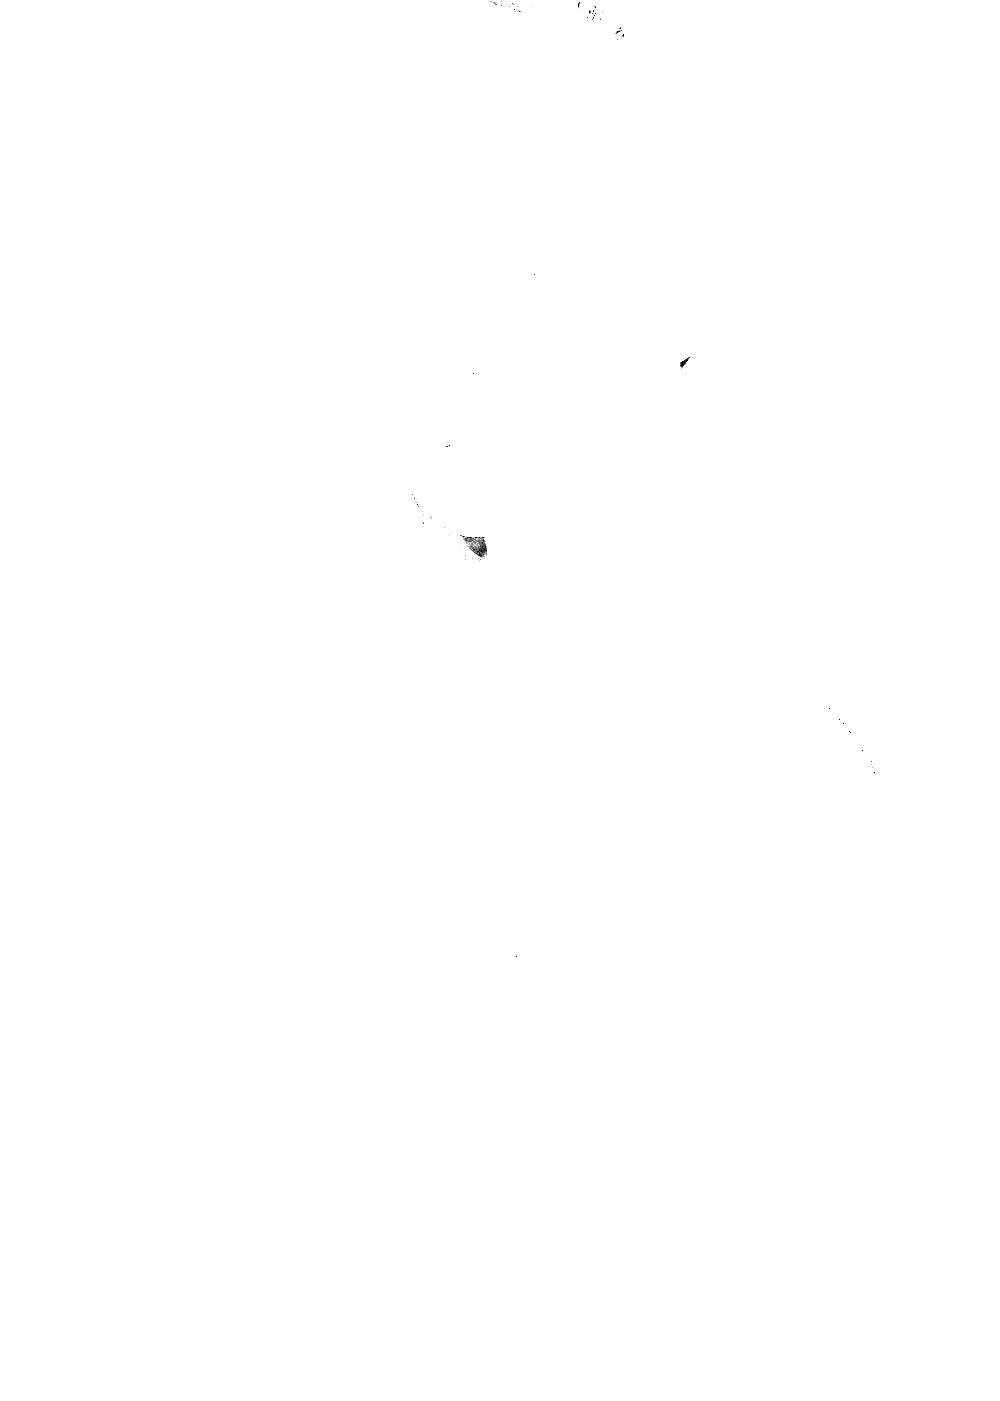 20161229-DSC_0278.png